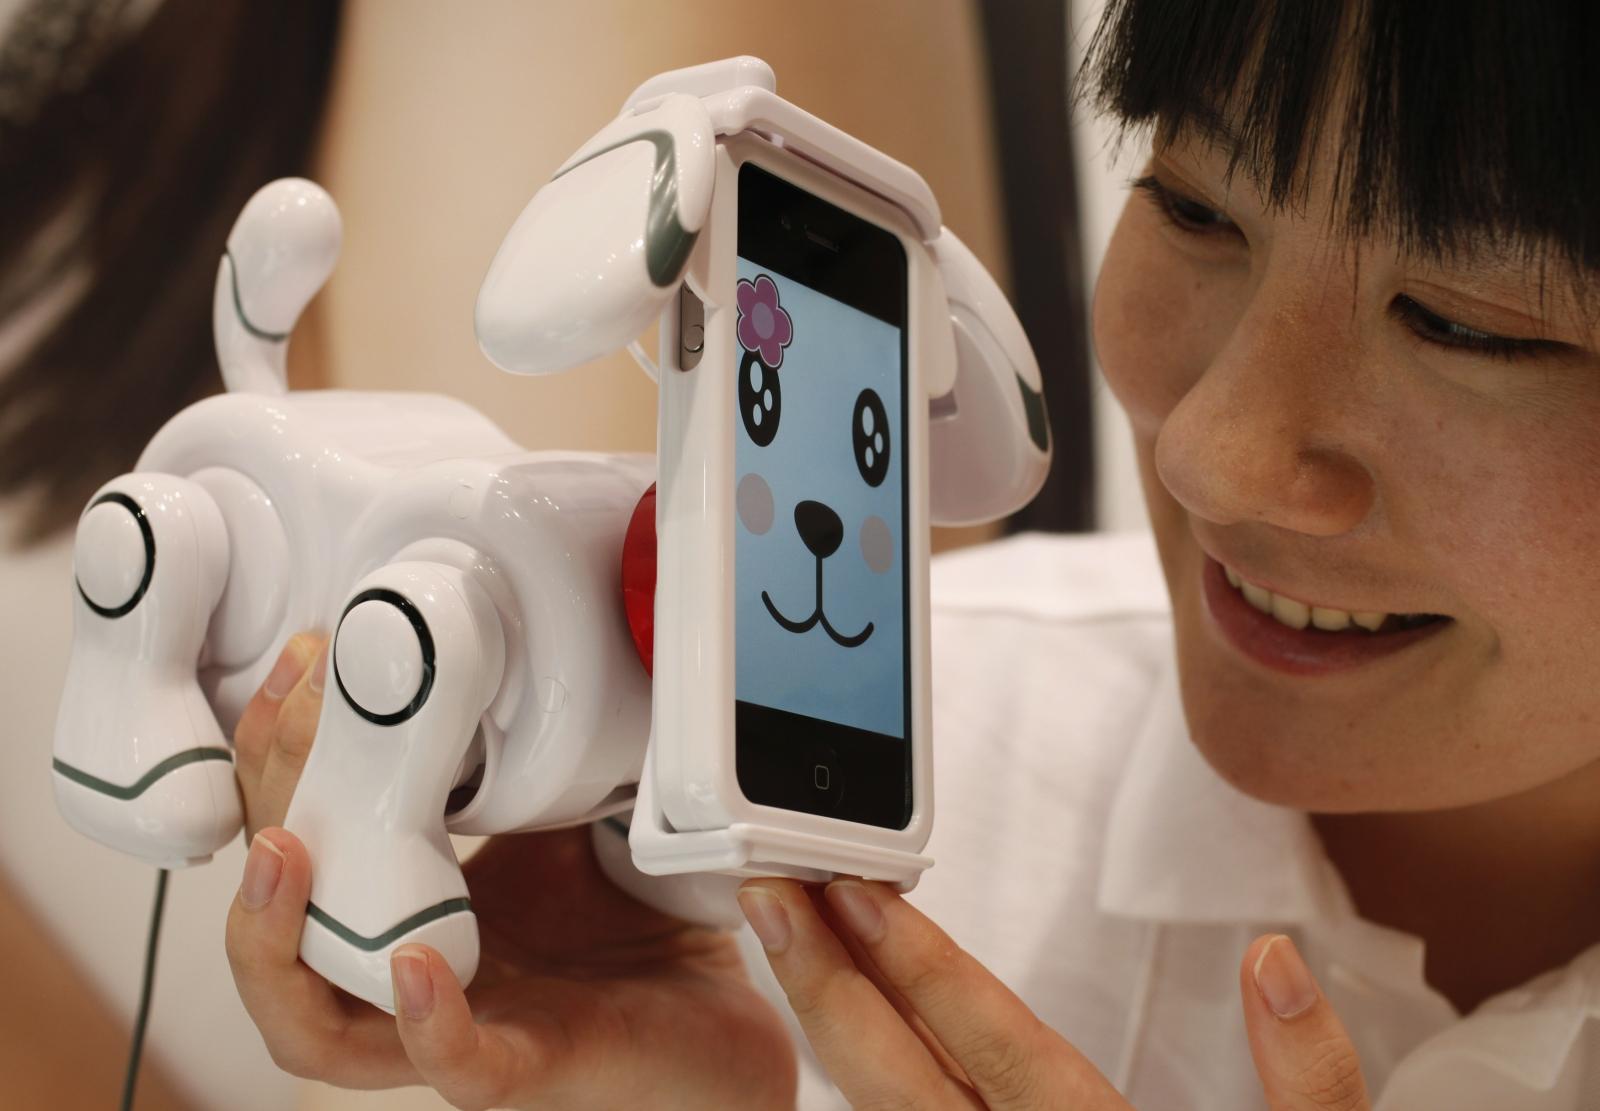 Bandai Smart Pet iPhone app